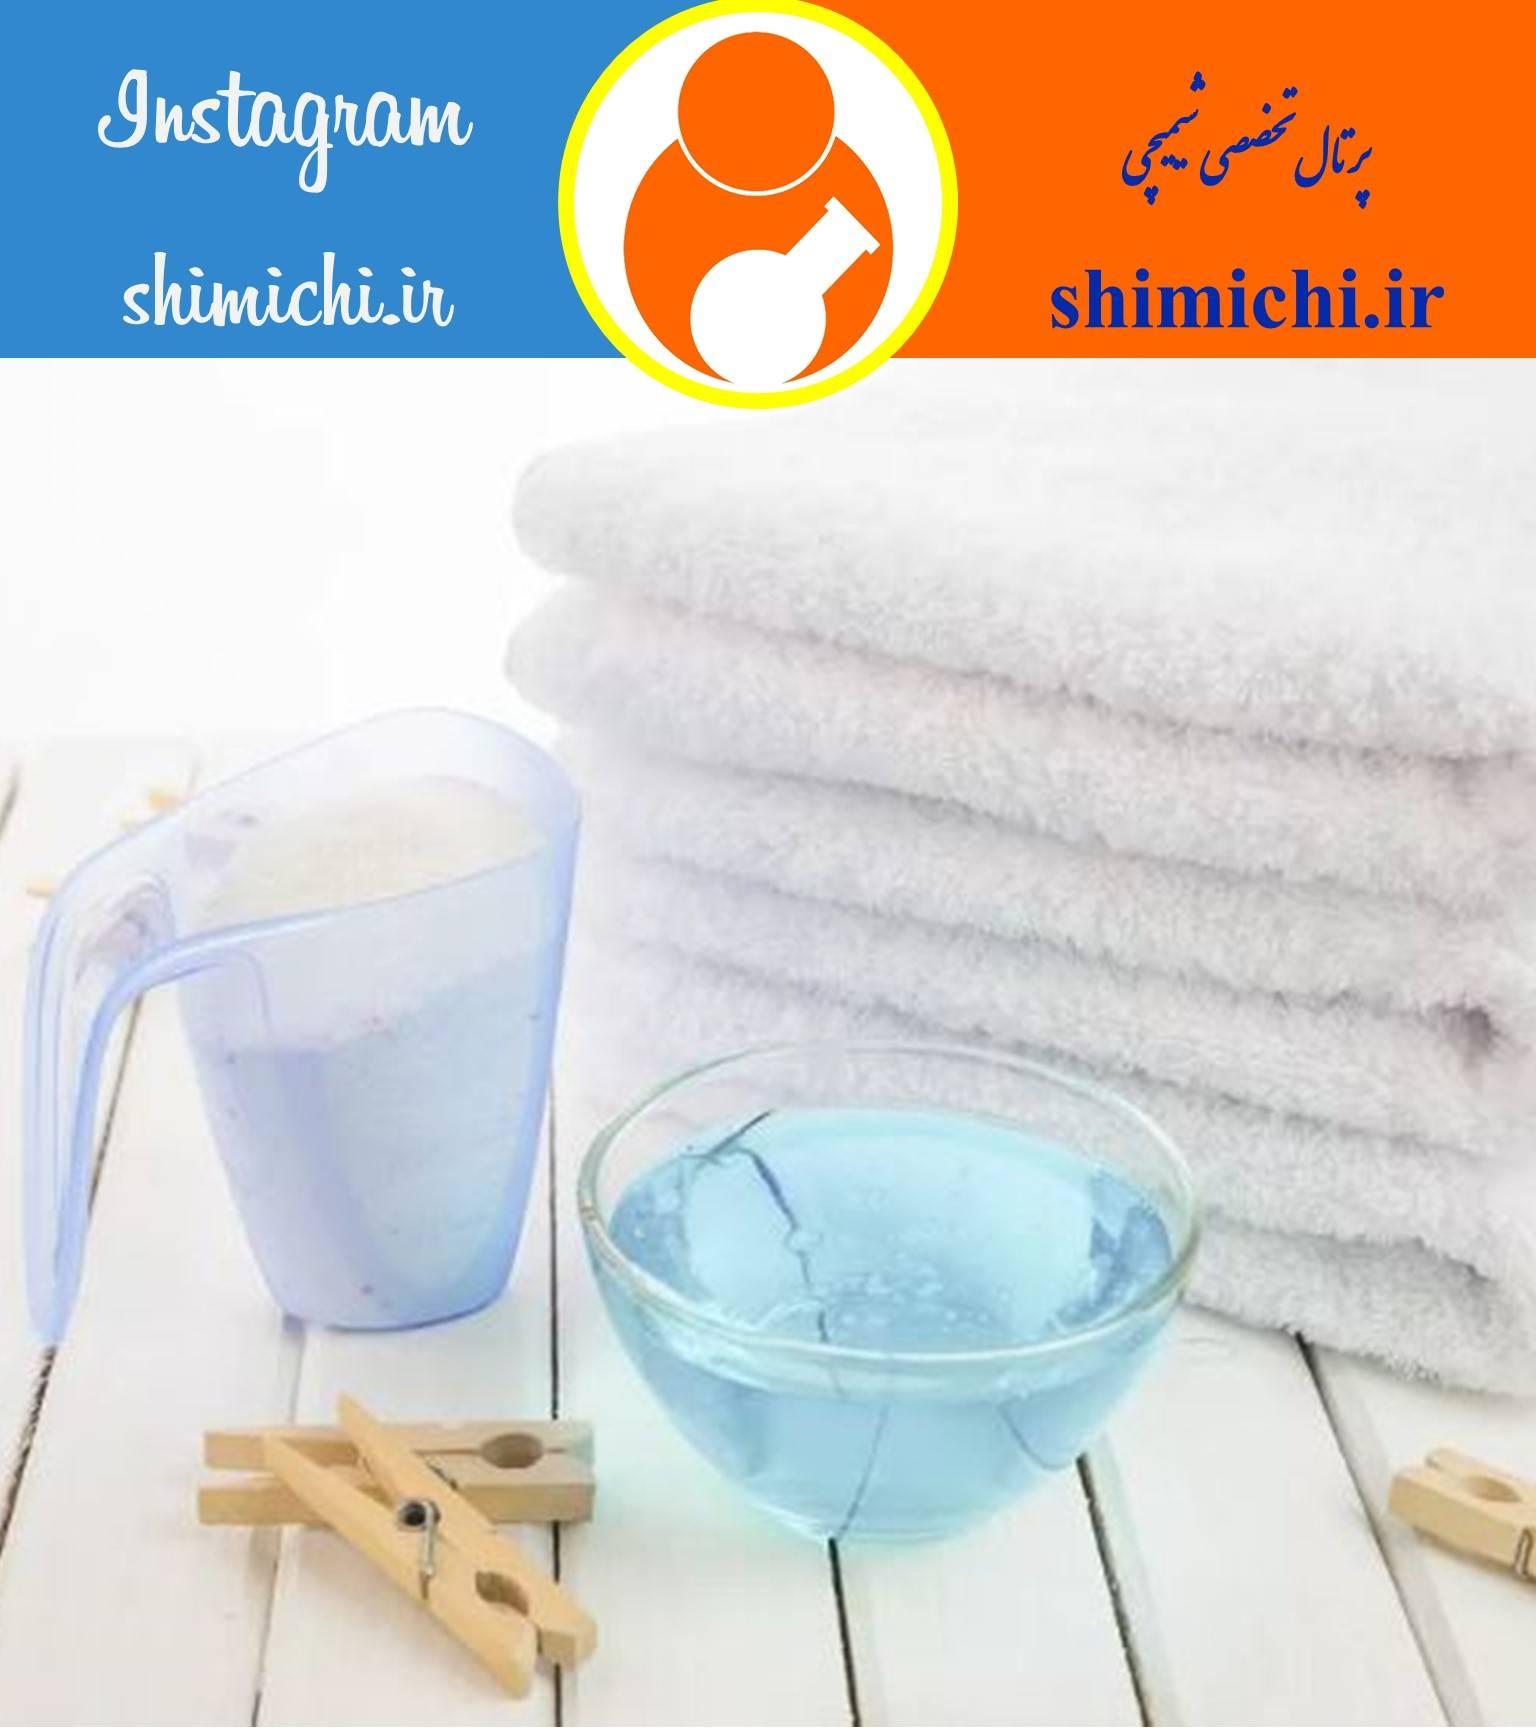 powder-and-liq-laundry۱-shimichi فرمولاسیون پودر لباسشویی | خط تولید پودر ماشین لباسشویی | فرمول پودر لباسشویی